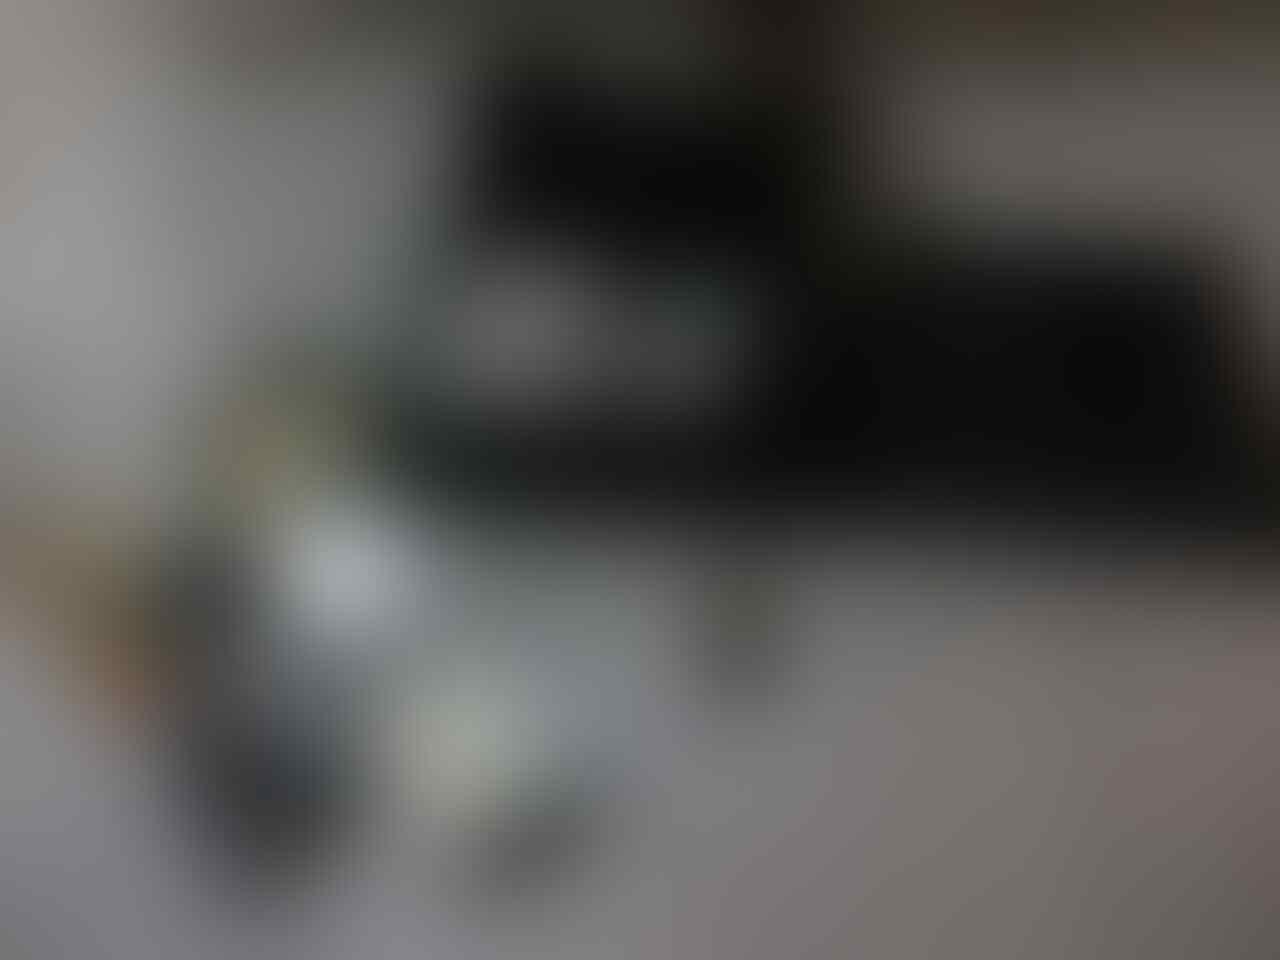 Blackberry 8530 Gemini White